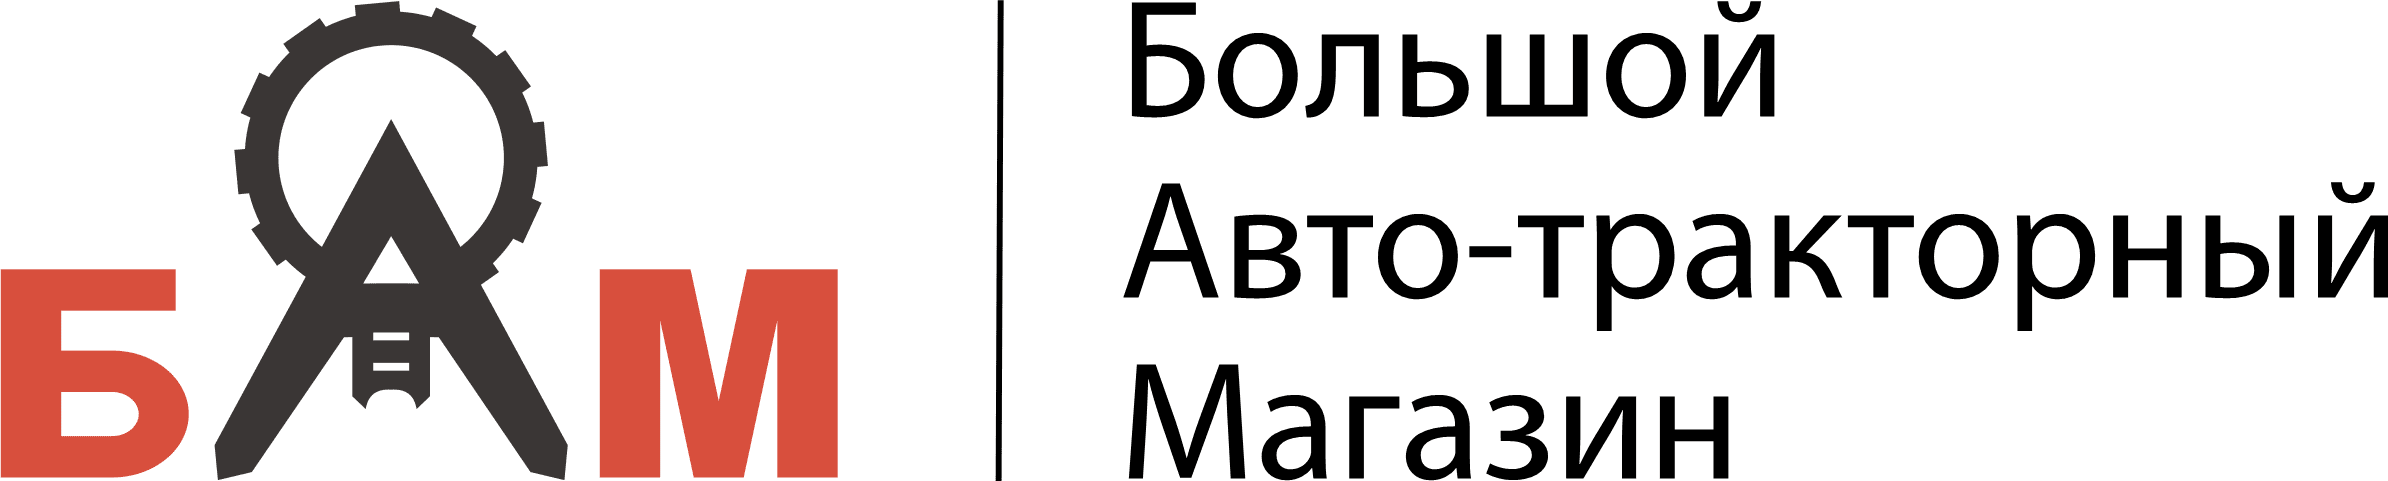 БАМ-АГРО, 8000 позиций автозапчастй на складе